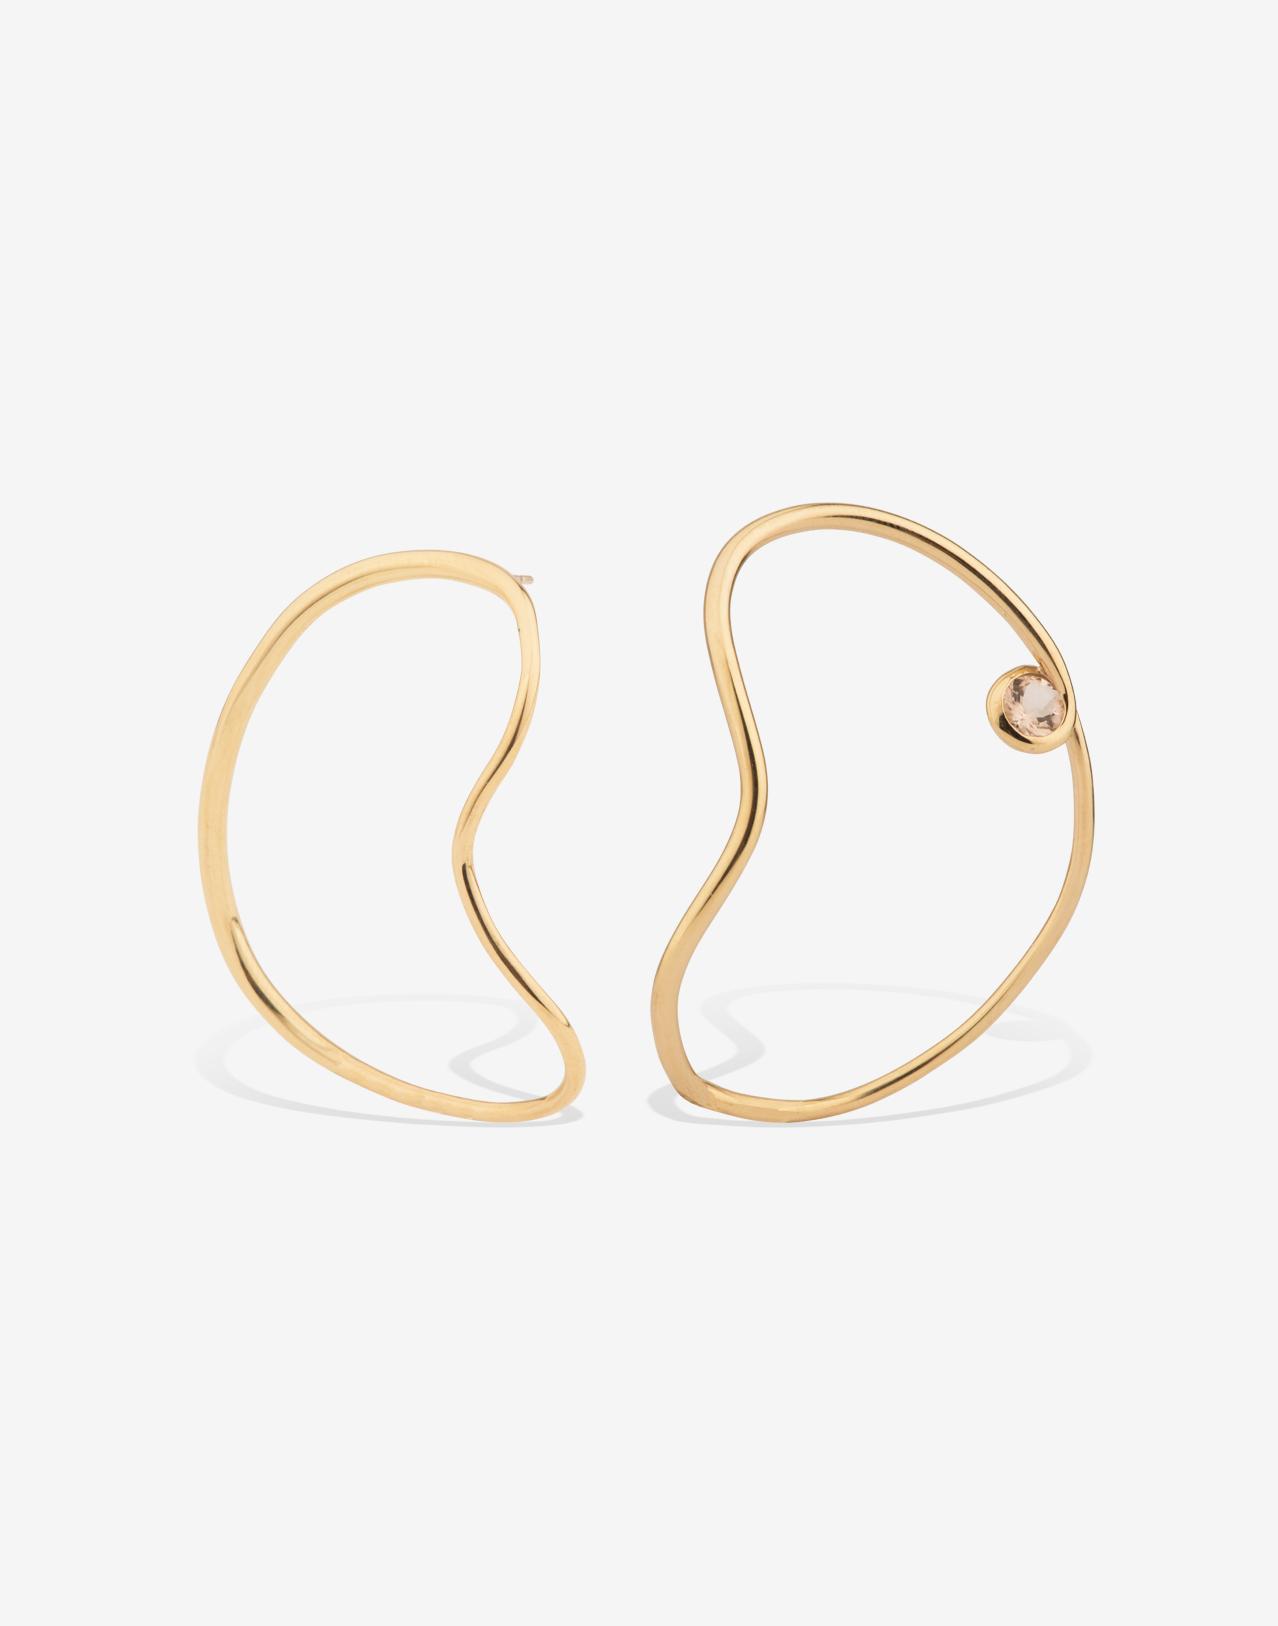 Completedworks-jewellery-S1007-Transference-Earrings-1-2.jpg